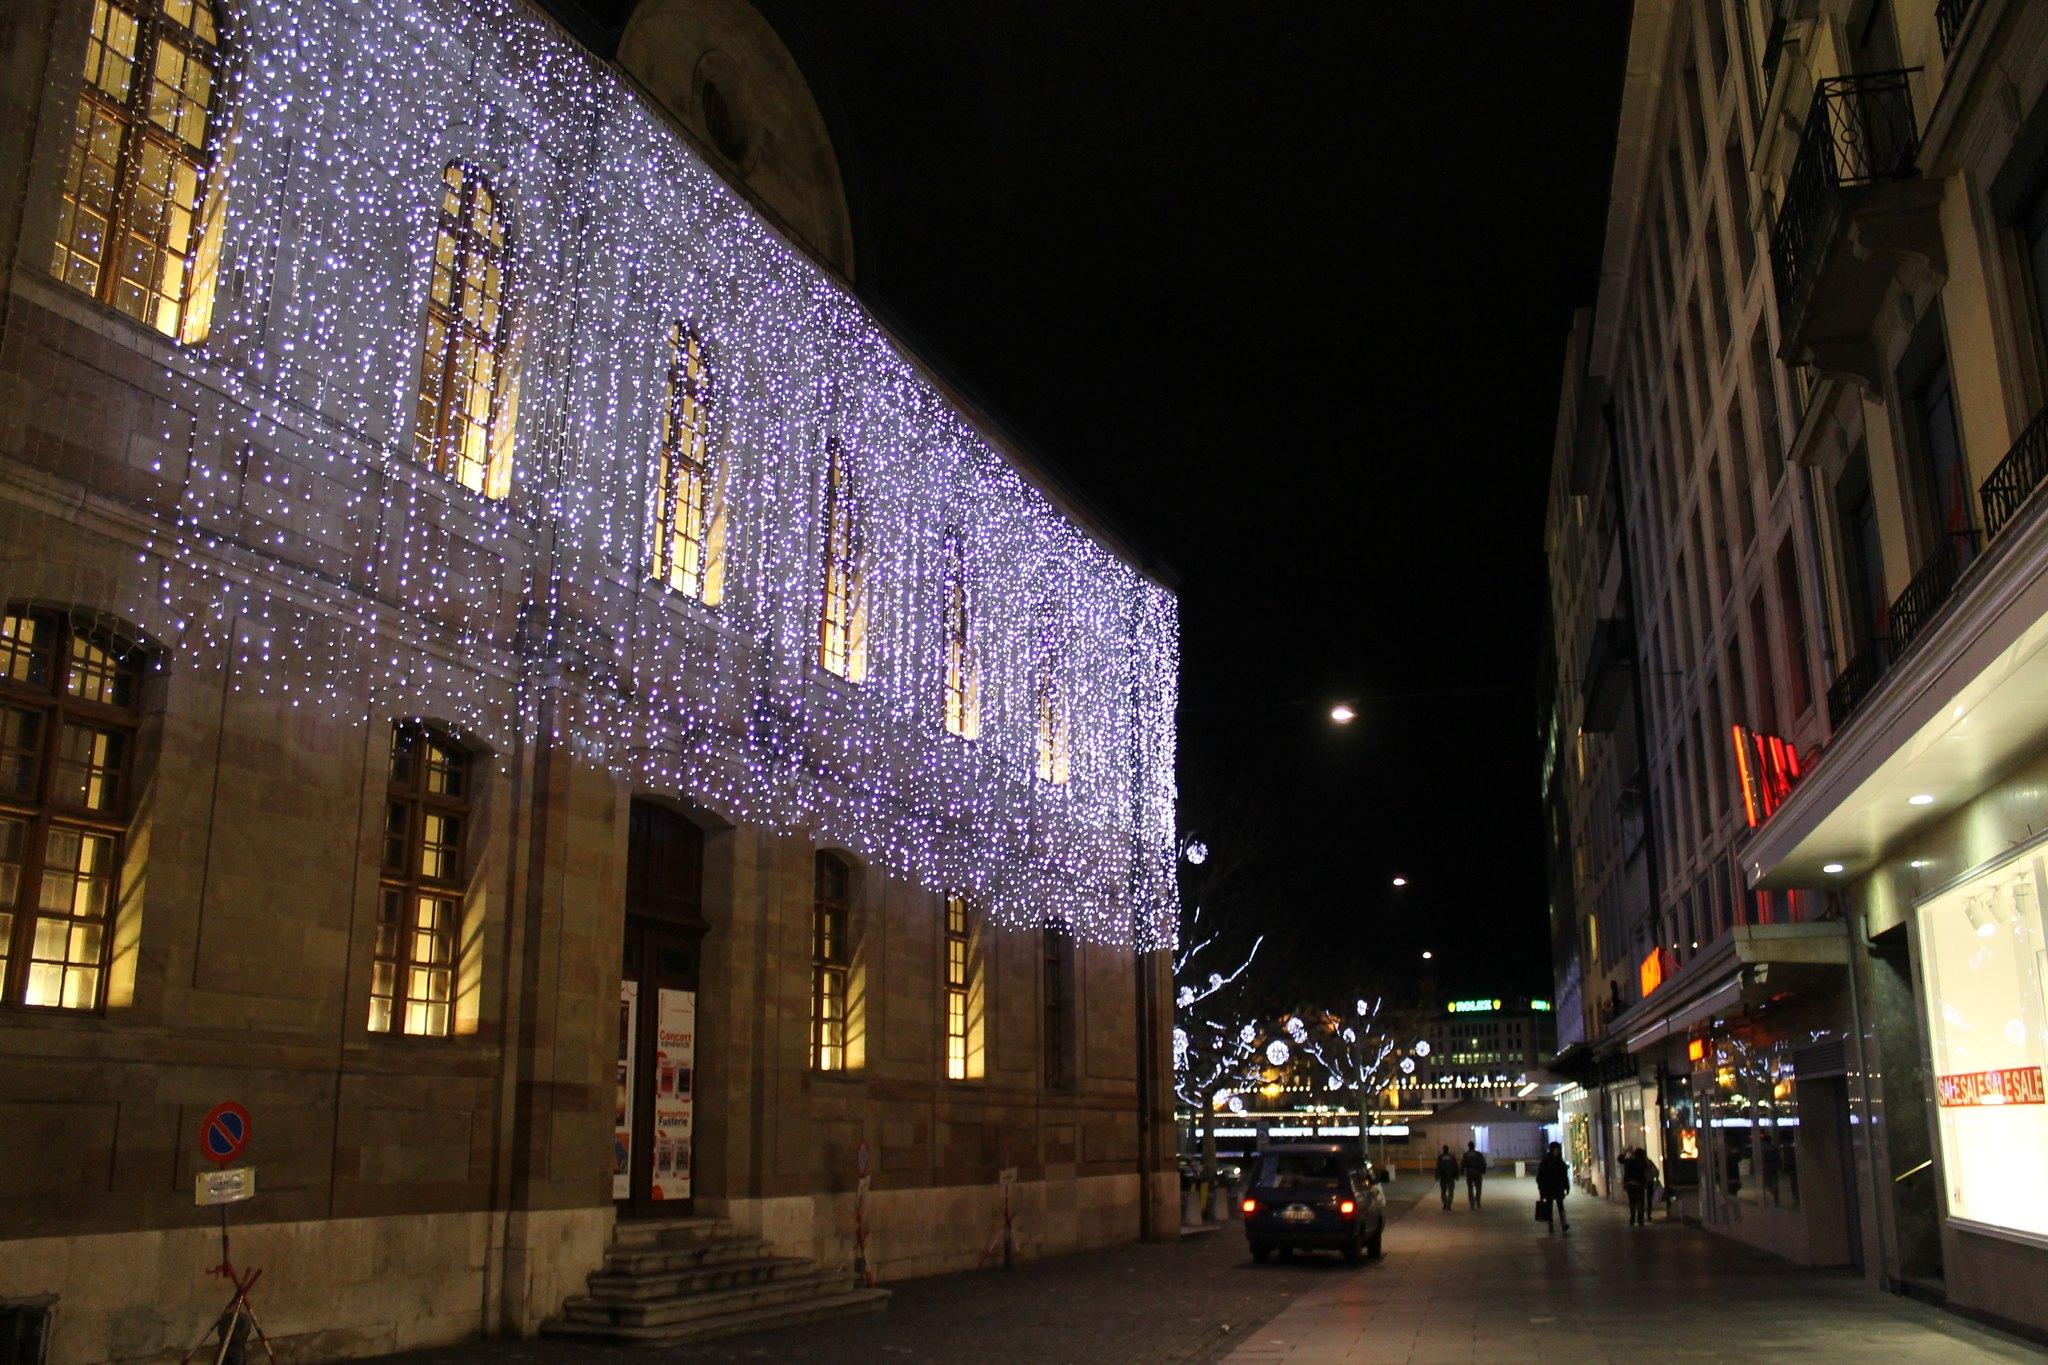 #988033 Christmas Decoration In Geneva 2012 Christmas  5545 decorations noel geneve 2048x1365 px @ aertt.com